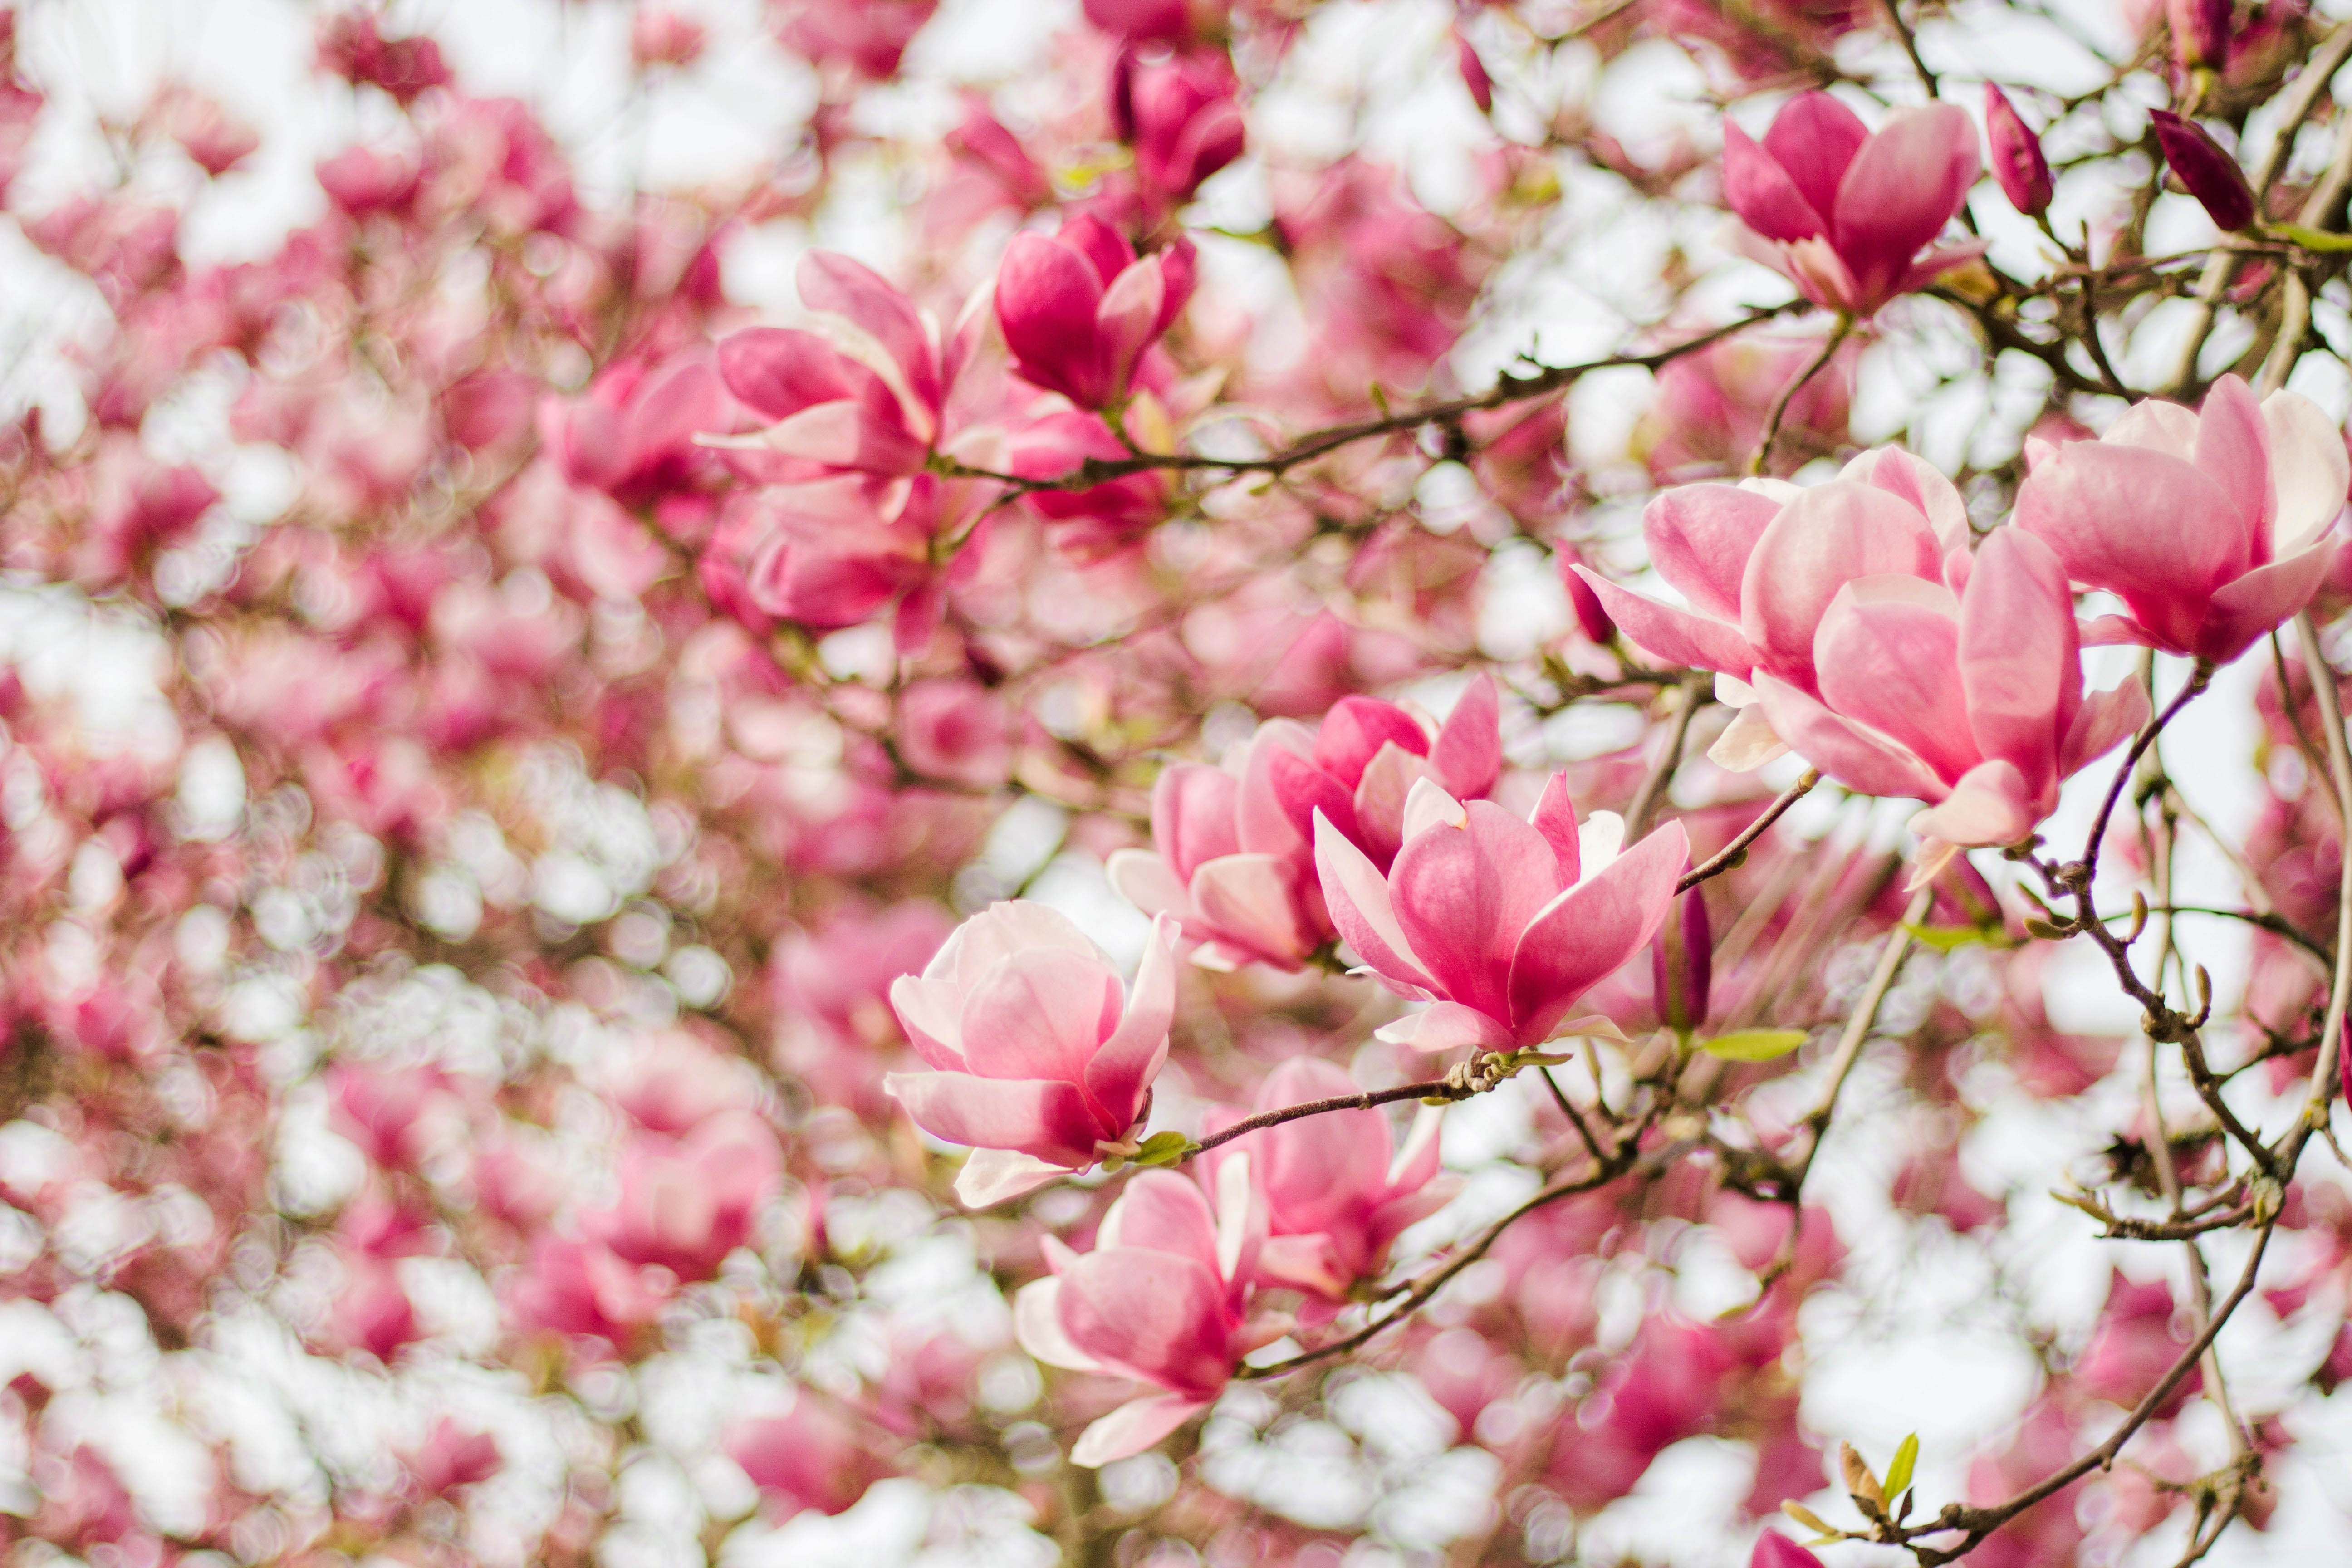 trắc nghiệm loài hoa hoa mộc lan